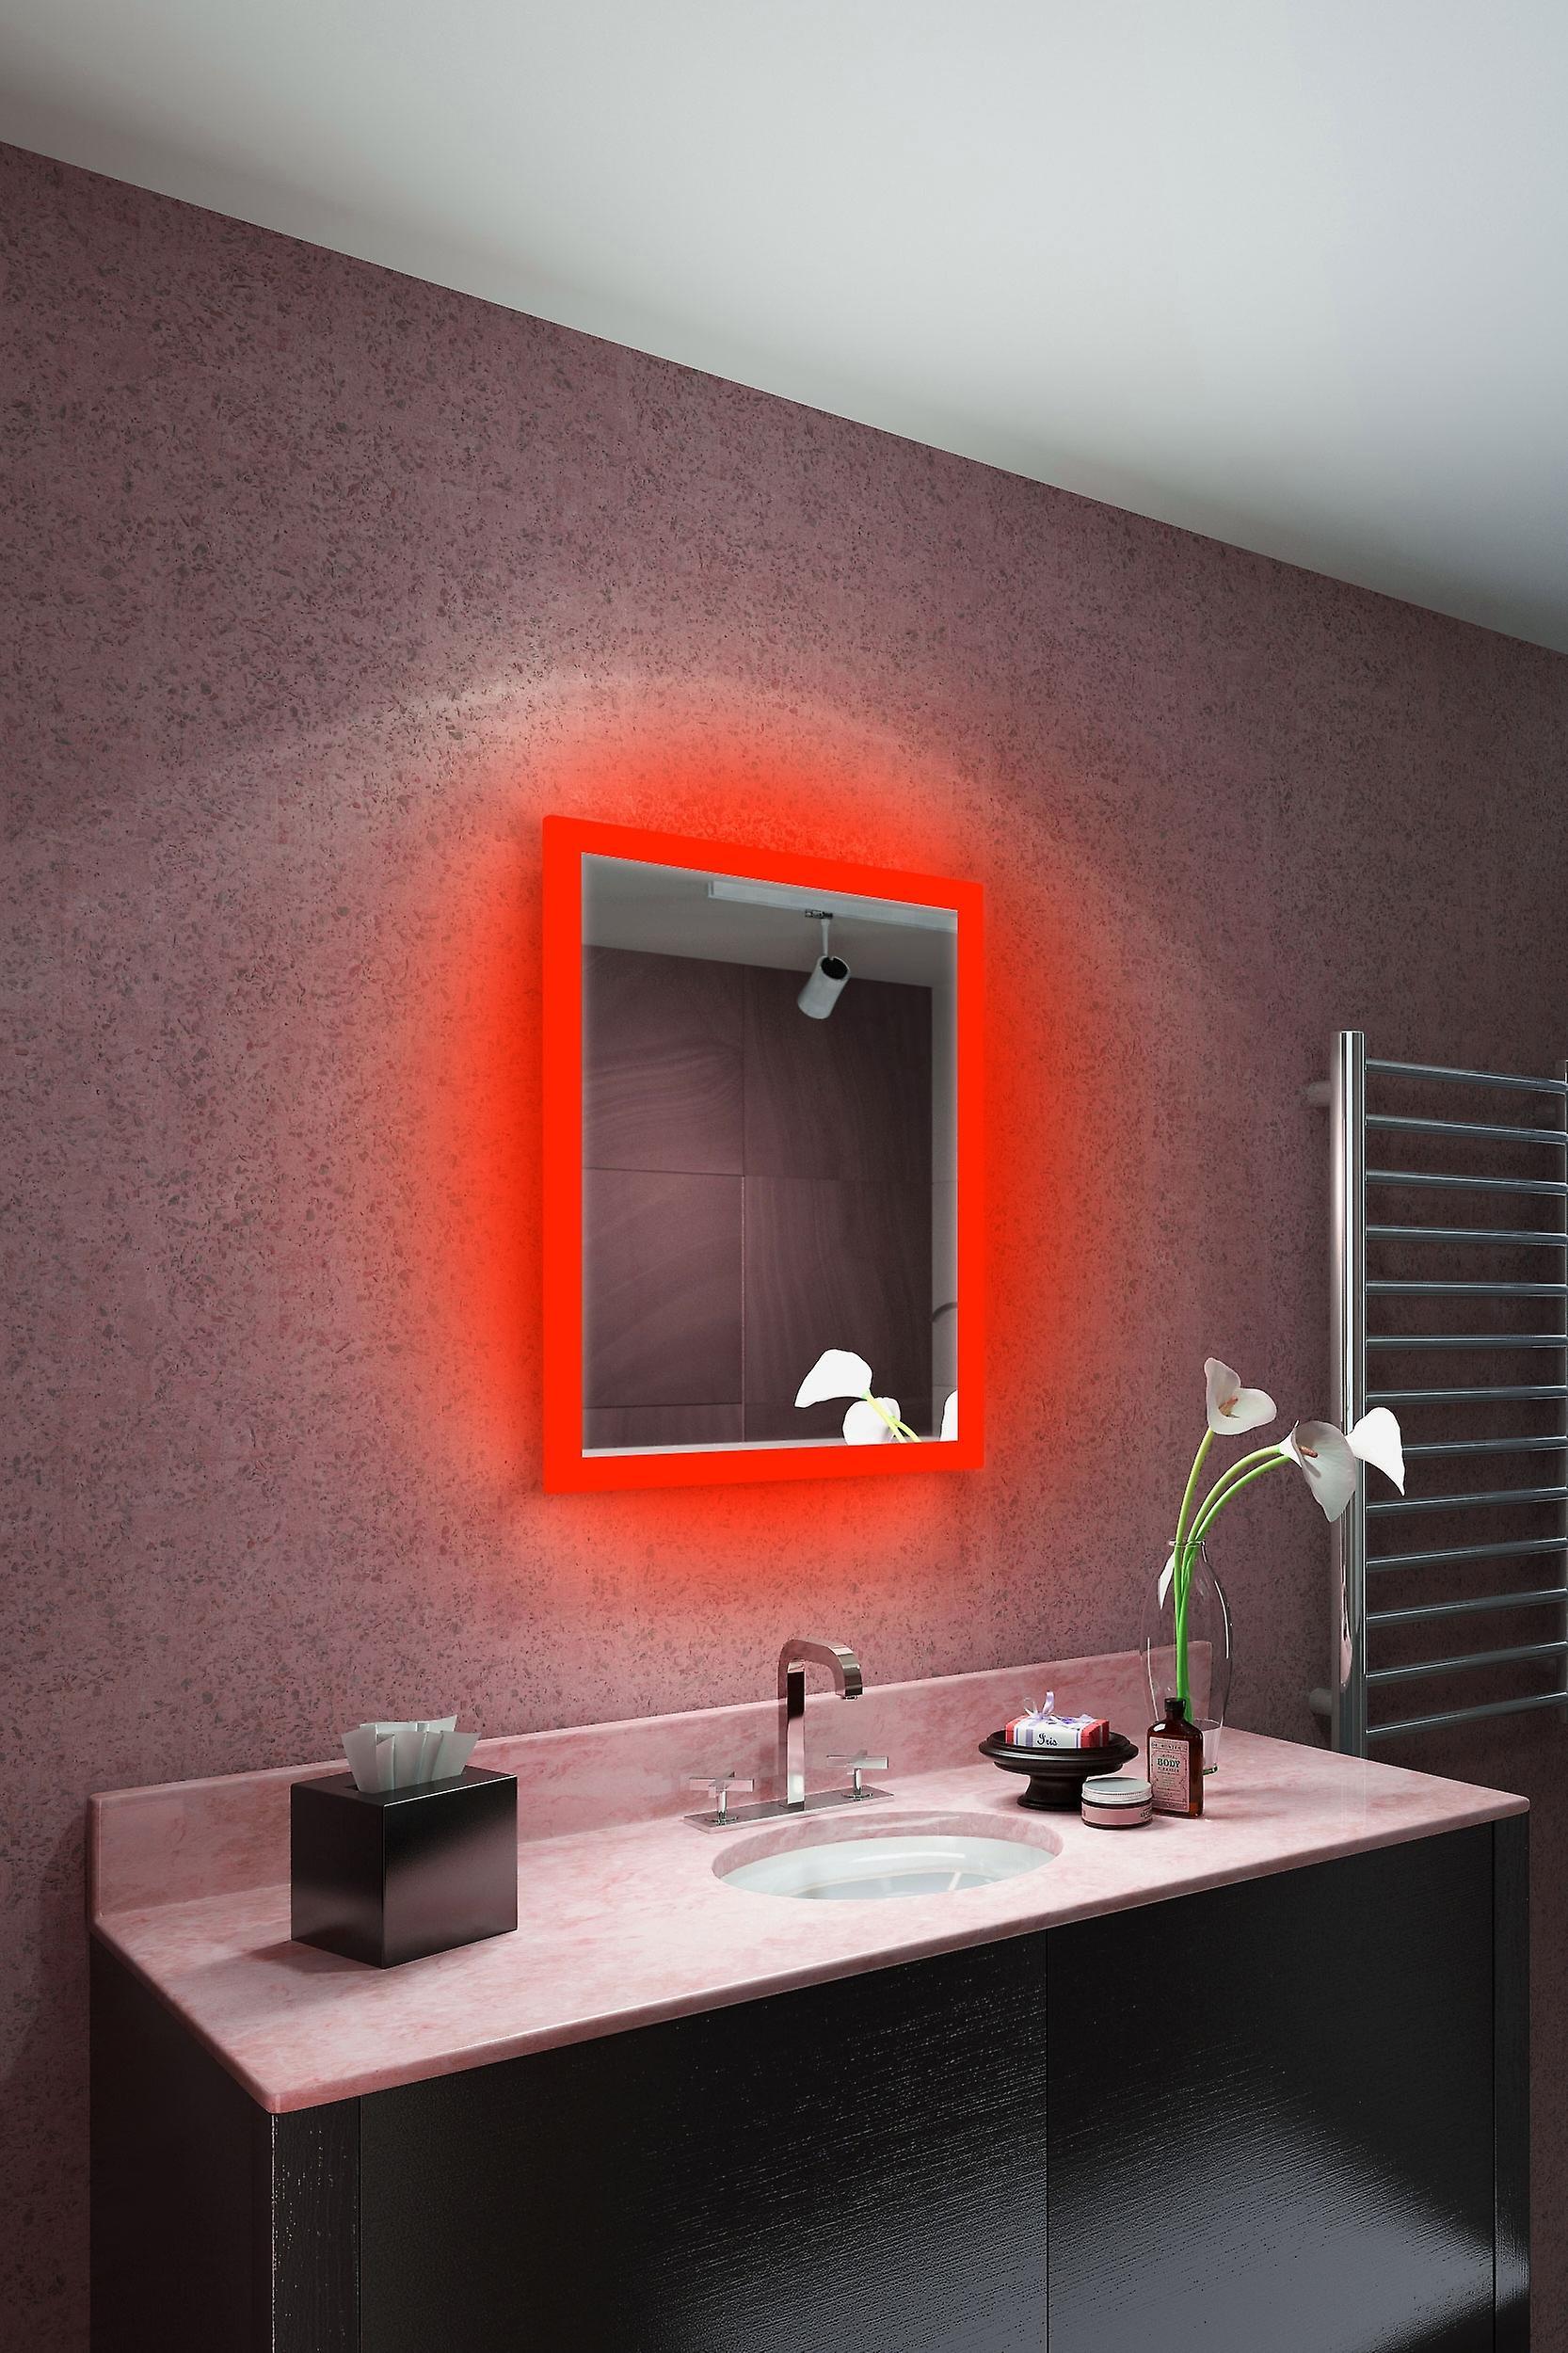 RGB Audio Shaver Mirror with Bluetooth, Demist, Sensor K1416irgbaud